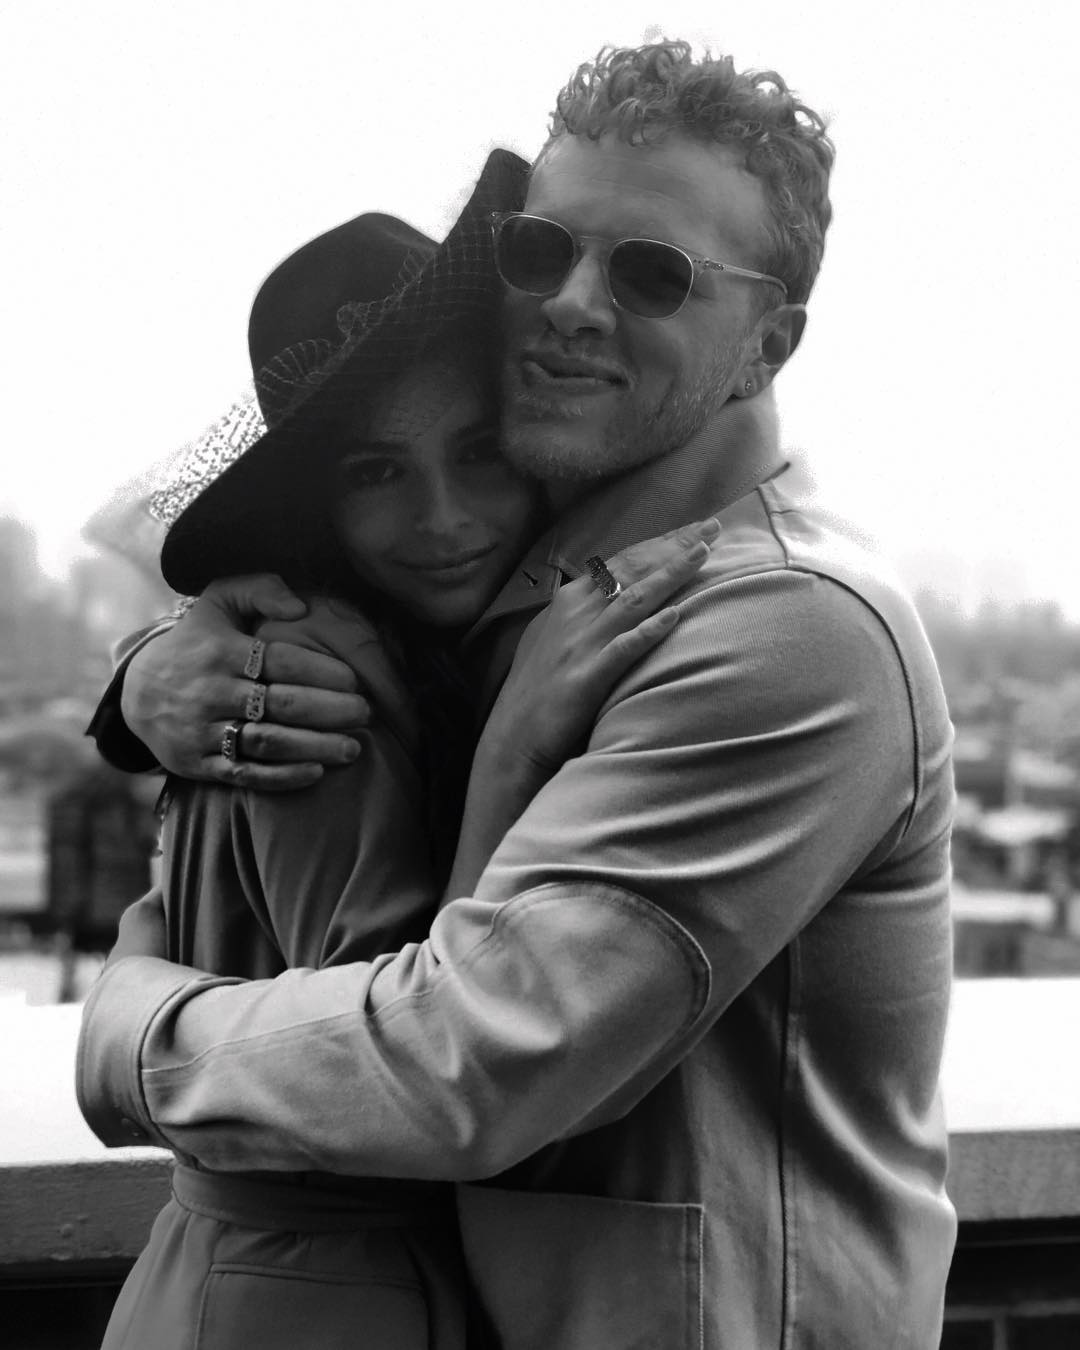 Sebastian Bear McClard and Emily Ratajkowski are hugging each other